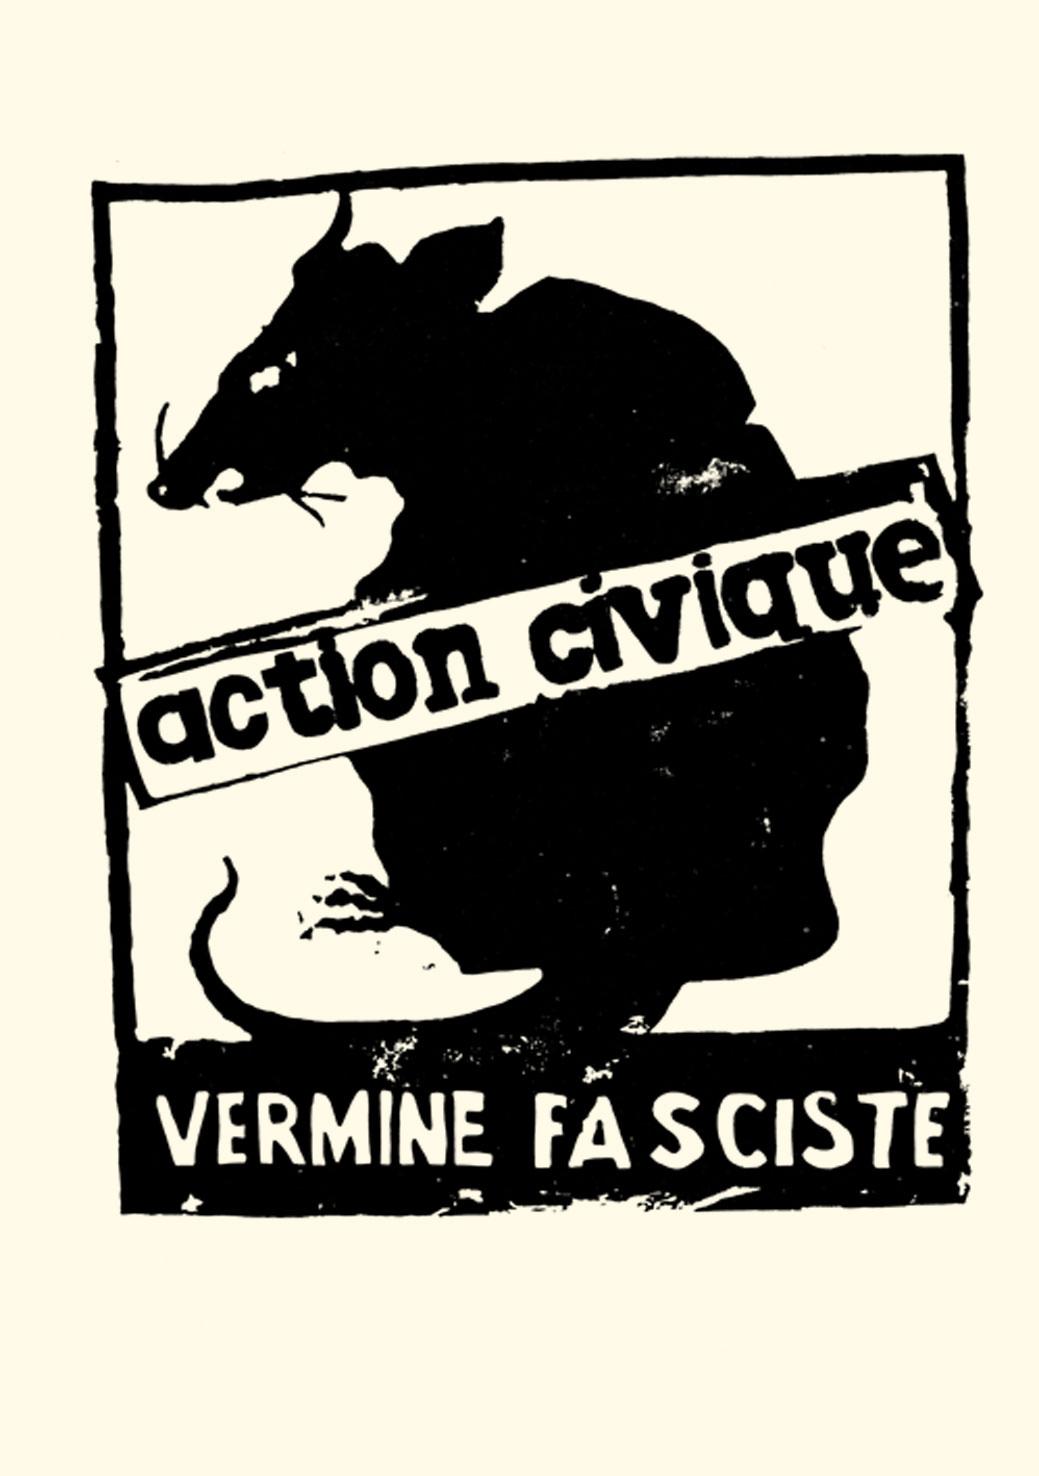 71-Civic-Action---Fascist-V copy.jpg